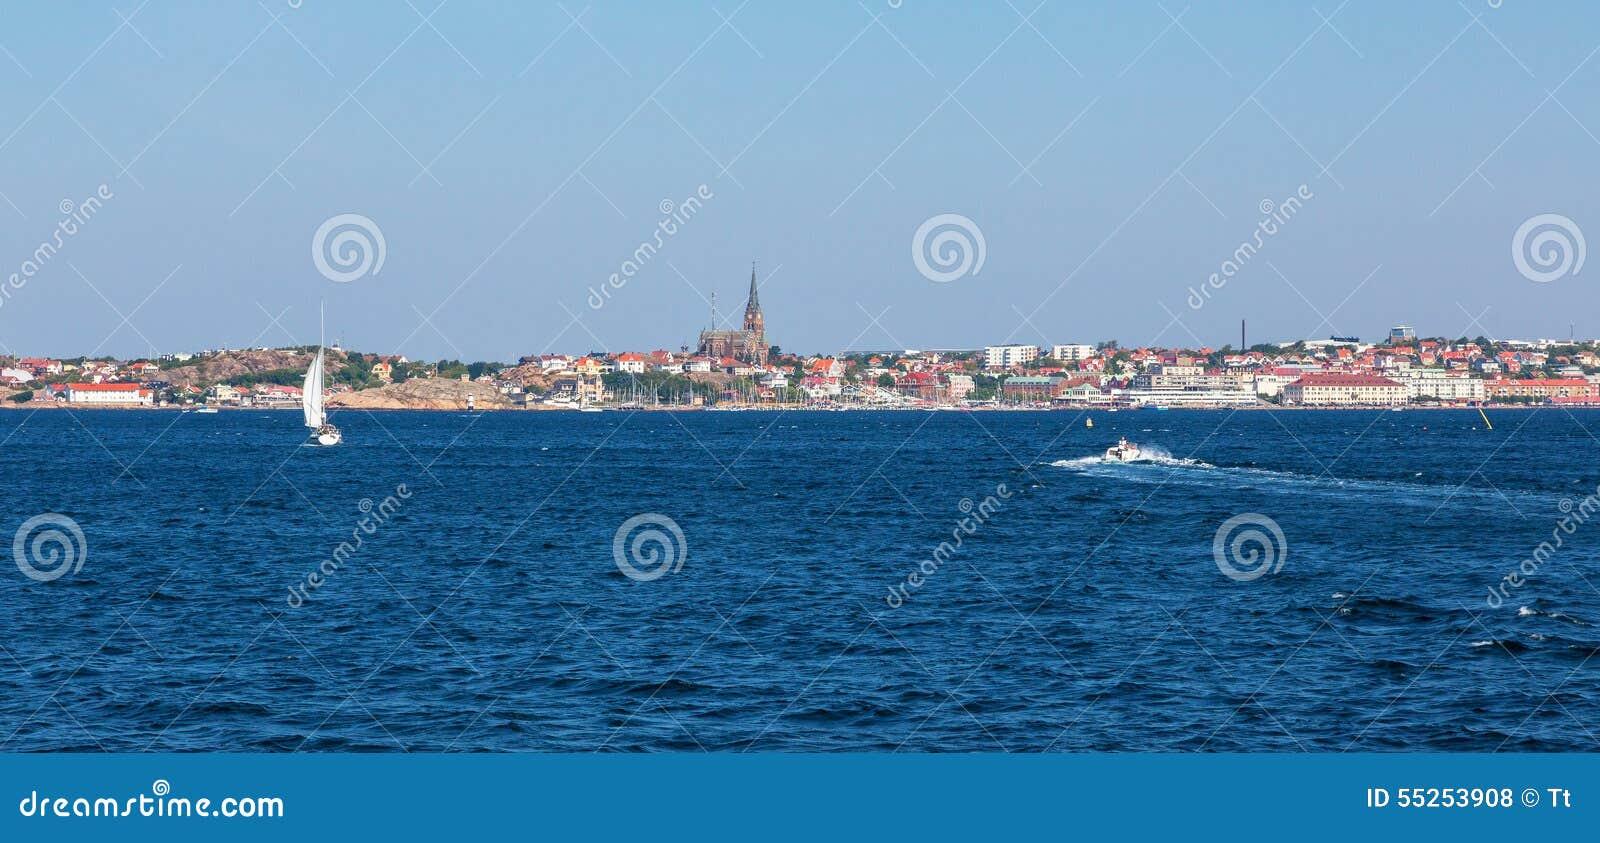 Città di Lysekil dal mare